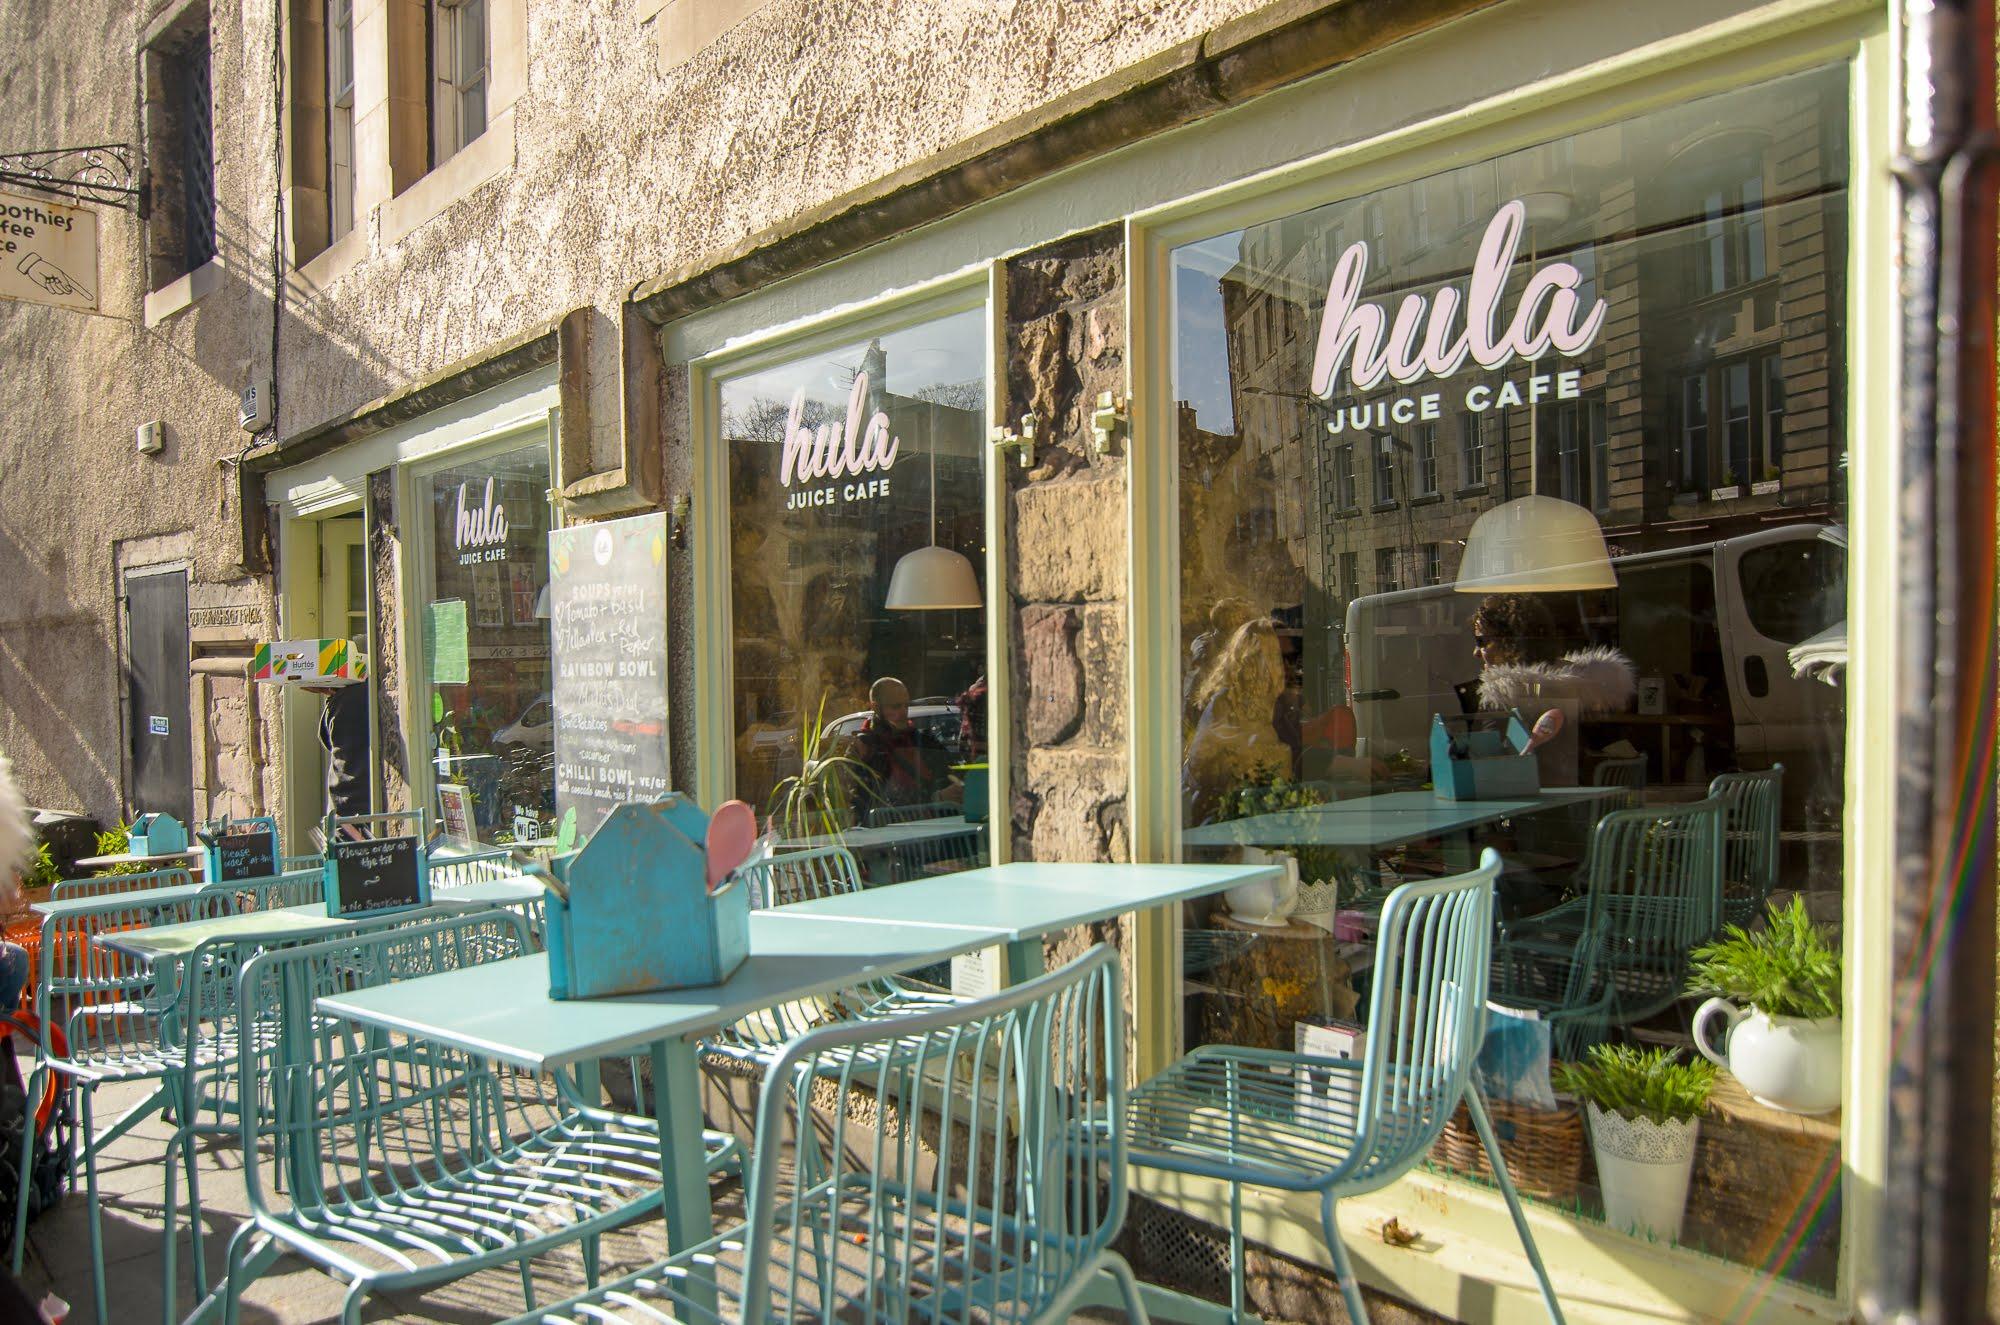 The outside of Hula Juice Cafe